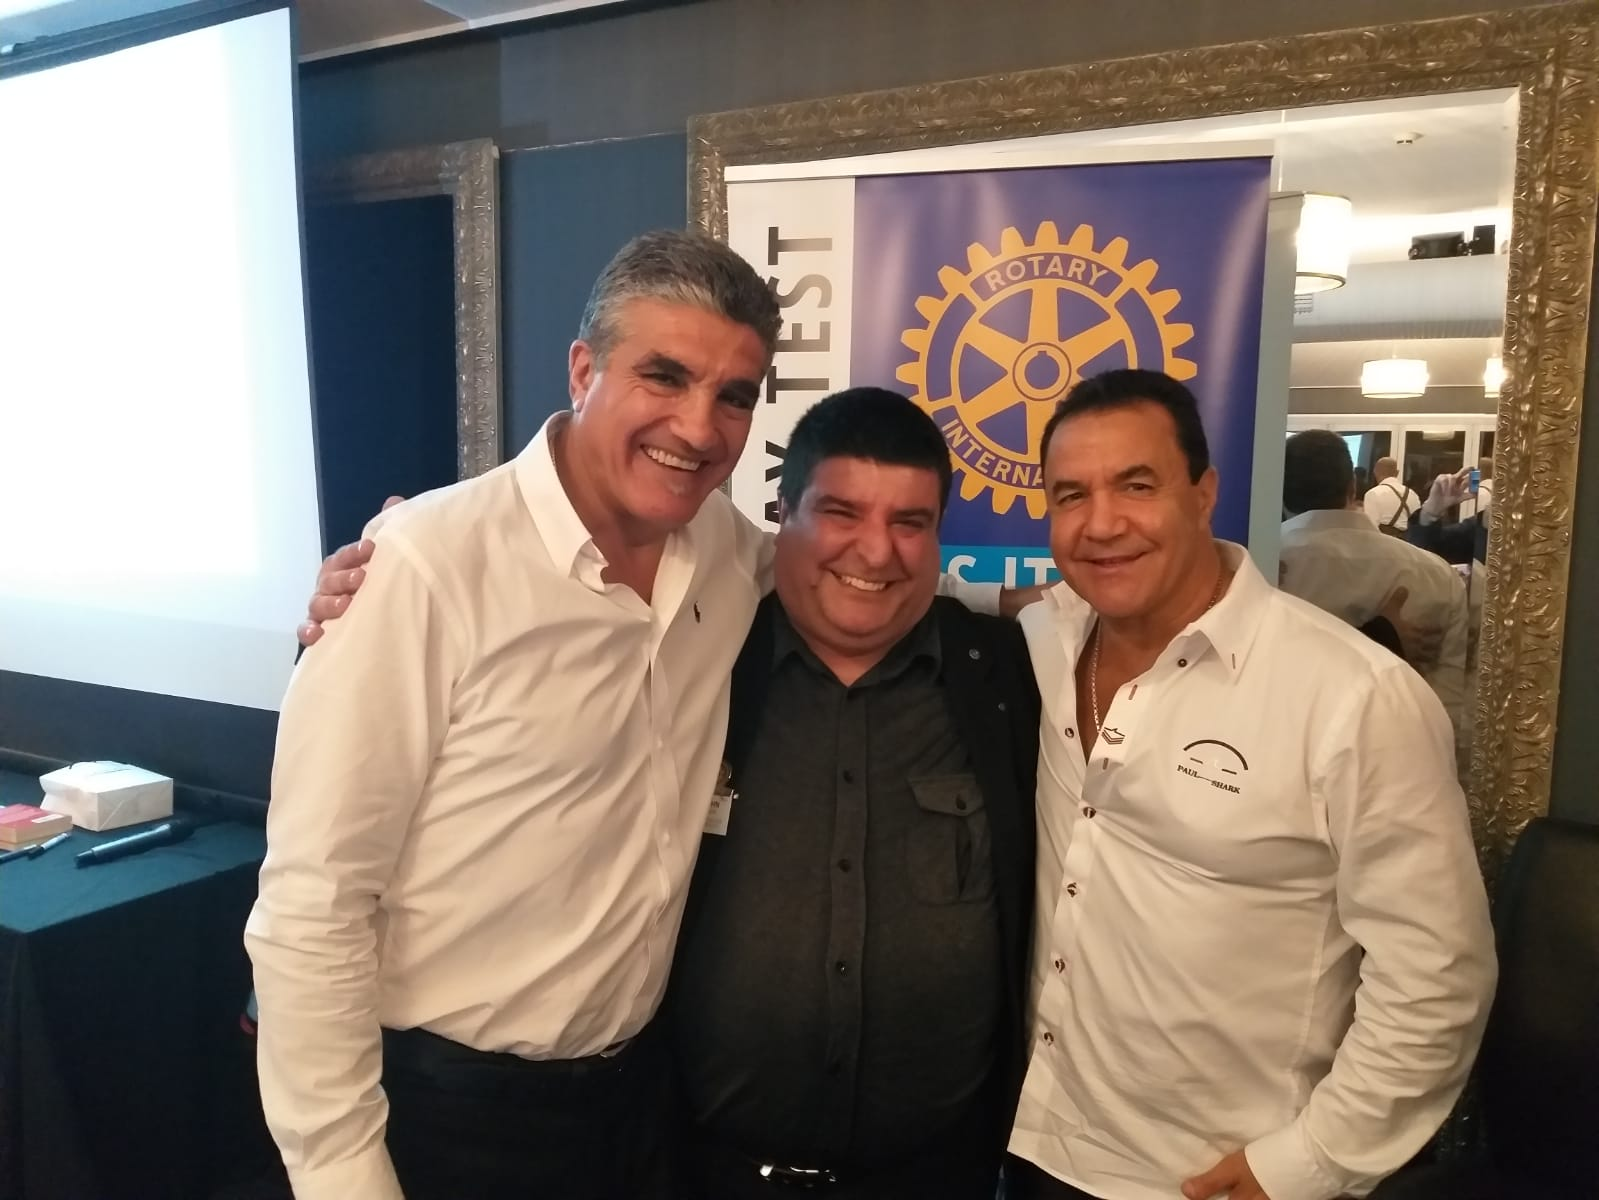 Mario Fenech Jeff Fenech Rotary International State Of Origin NRL John  Raciti FRSA – UX Design Sydney